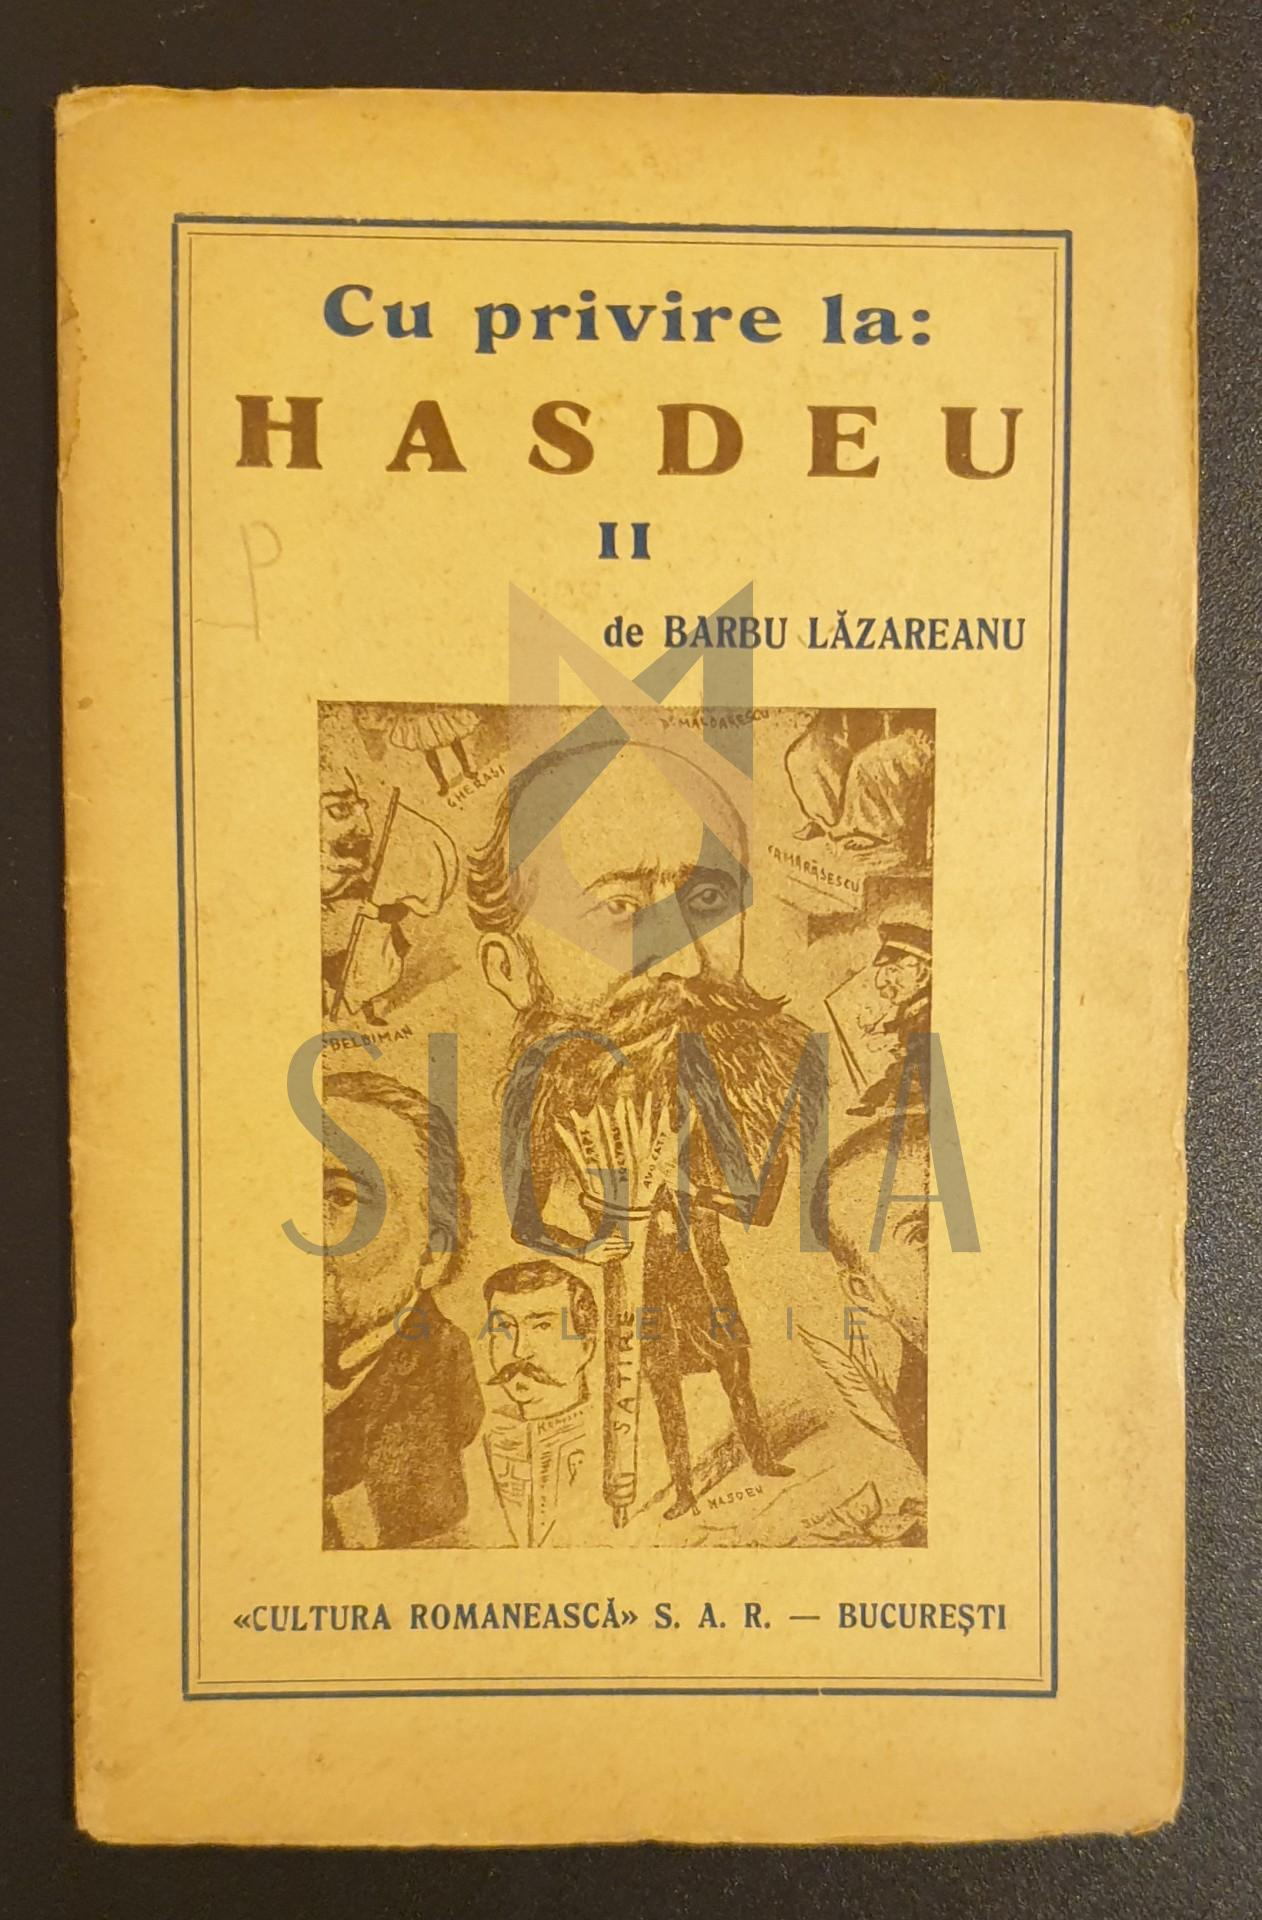 Cu privire la Hasdeu